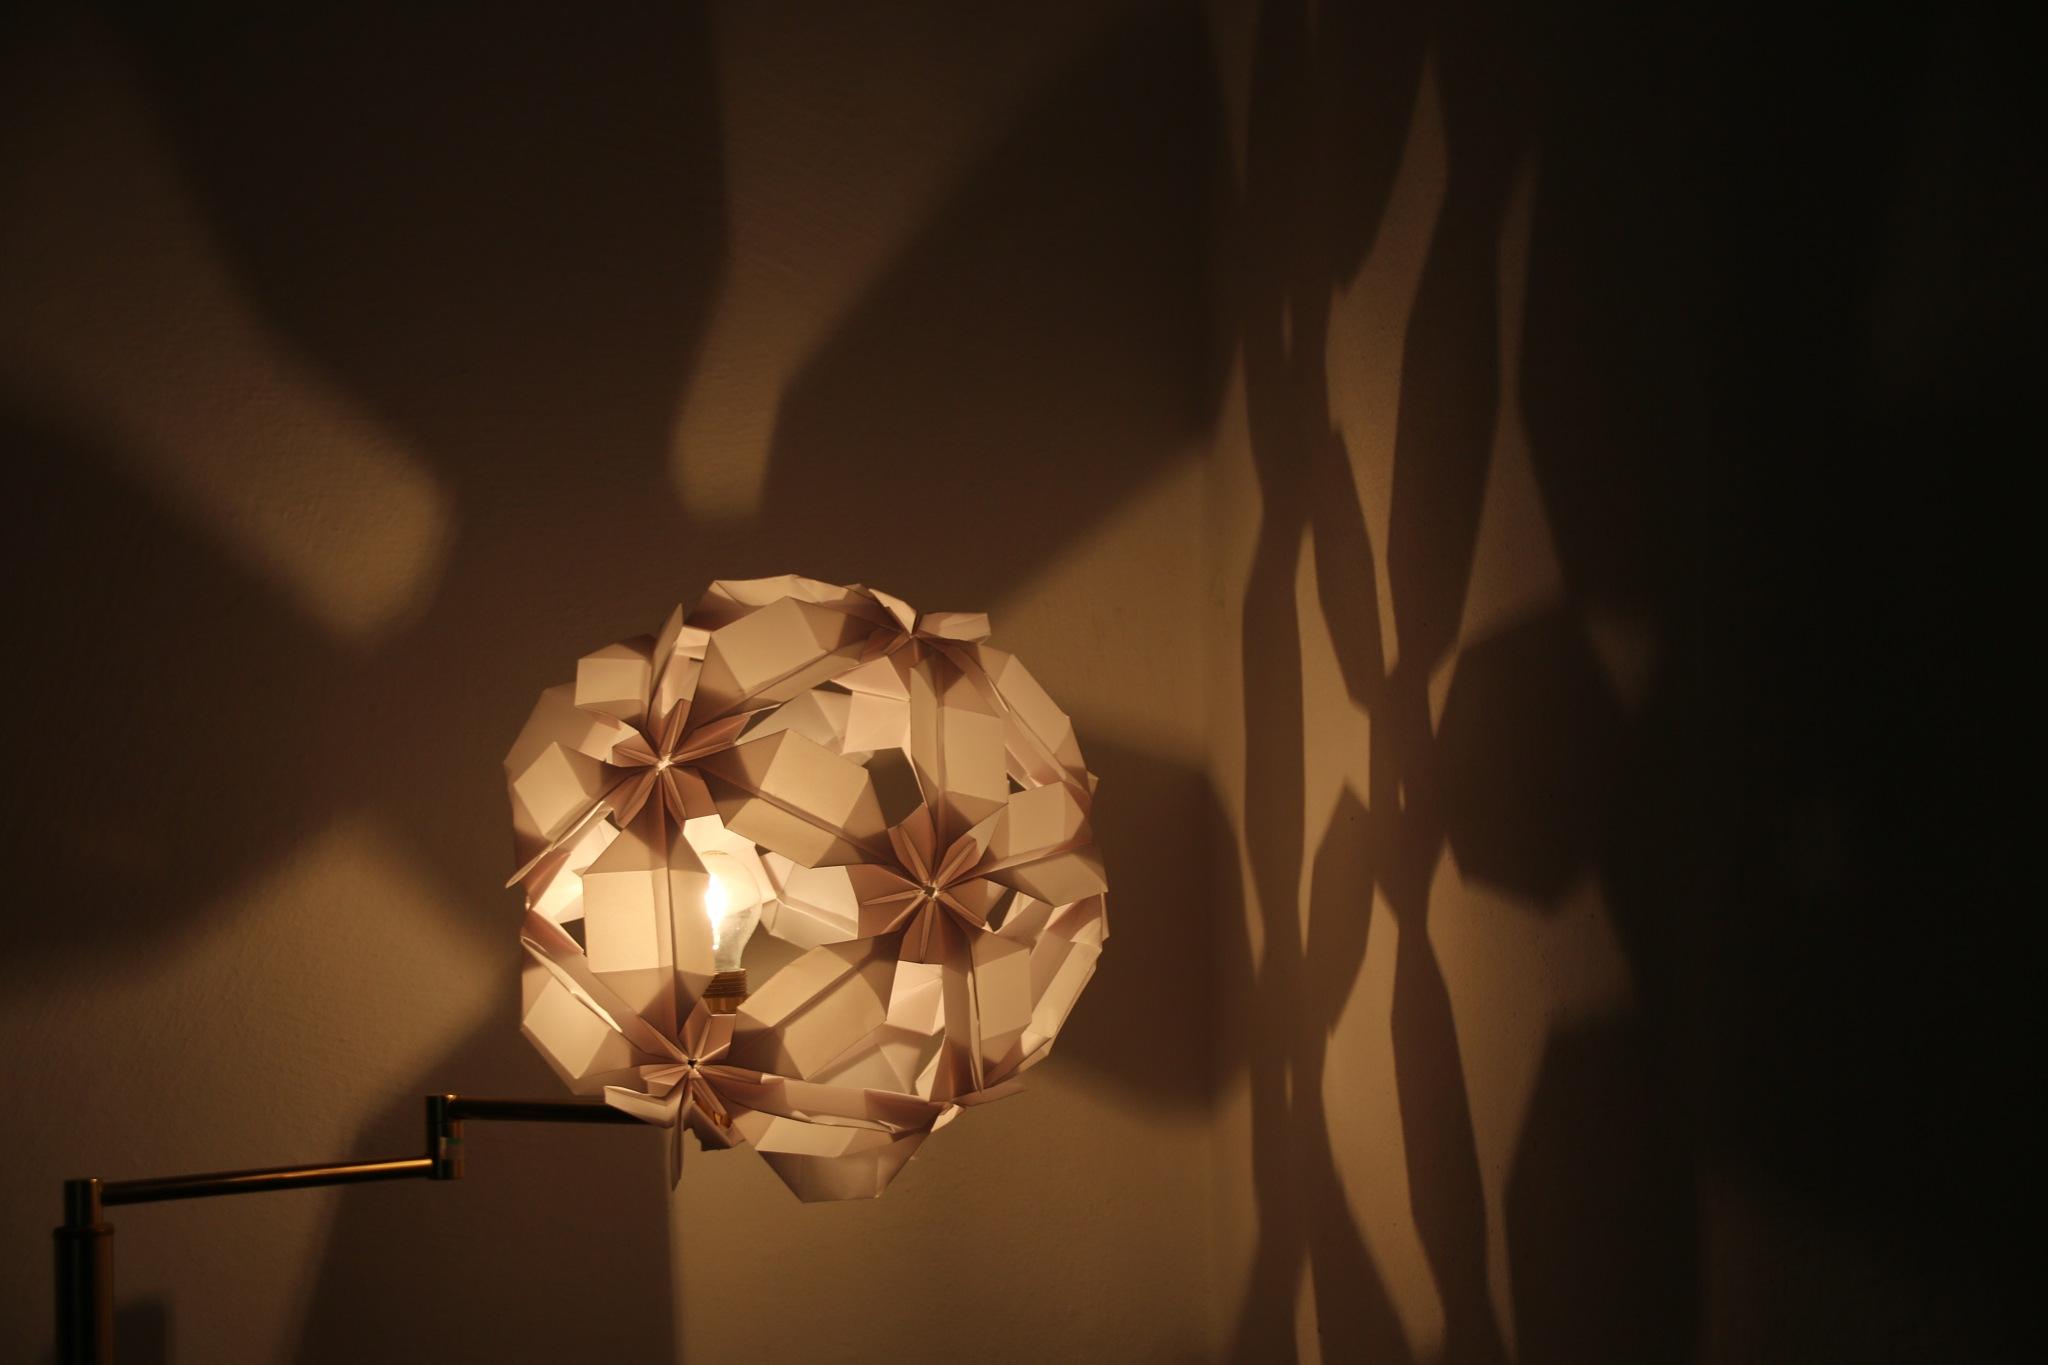 Light by Luana Popa